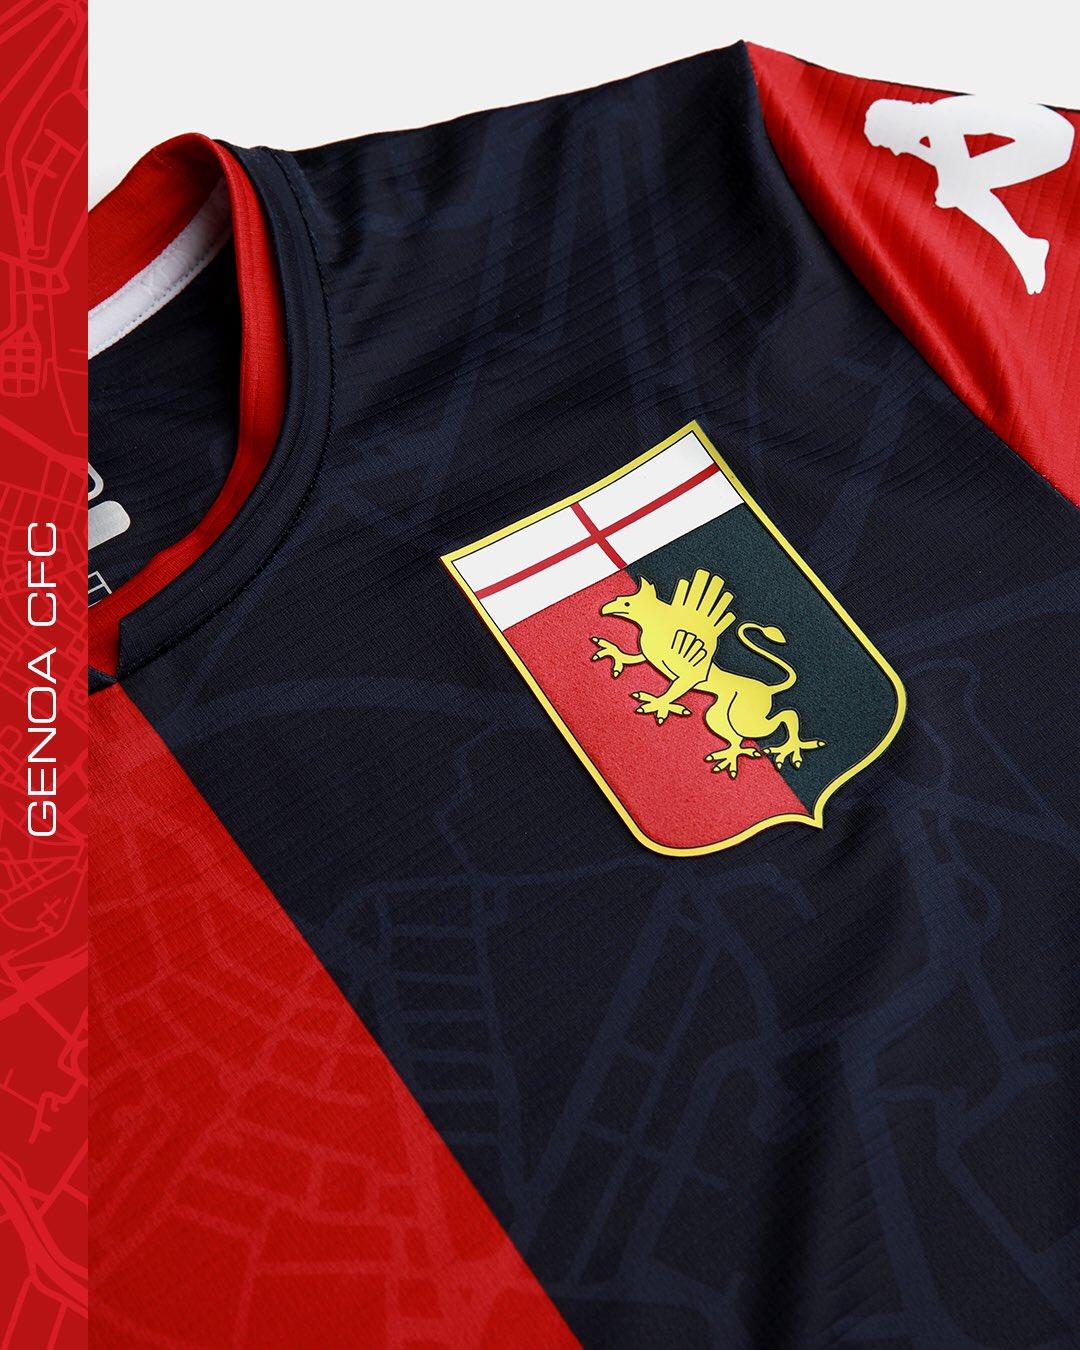 Maillot Genoa 2021-2022 Kappa